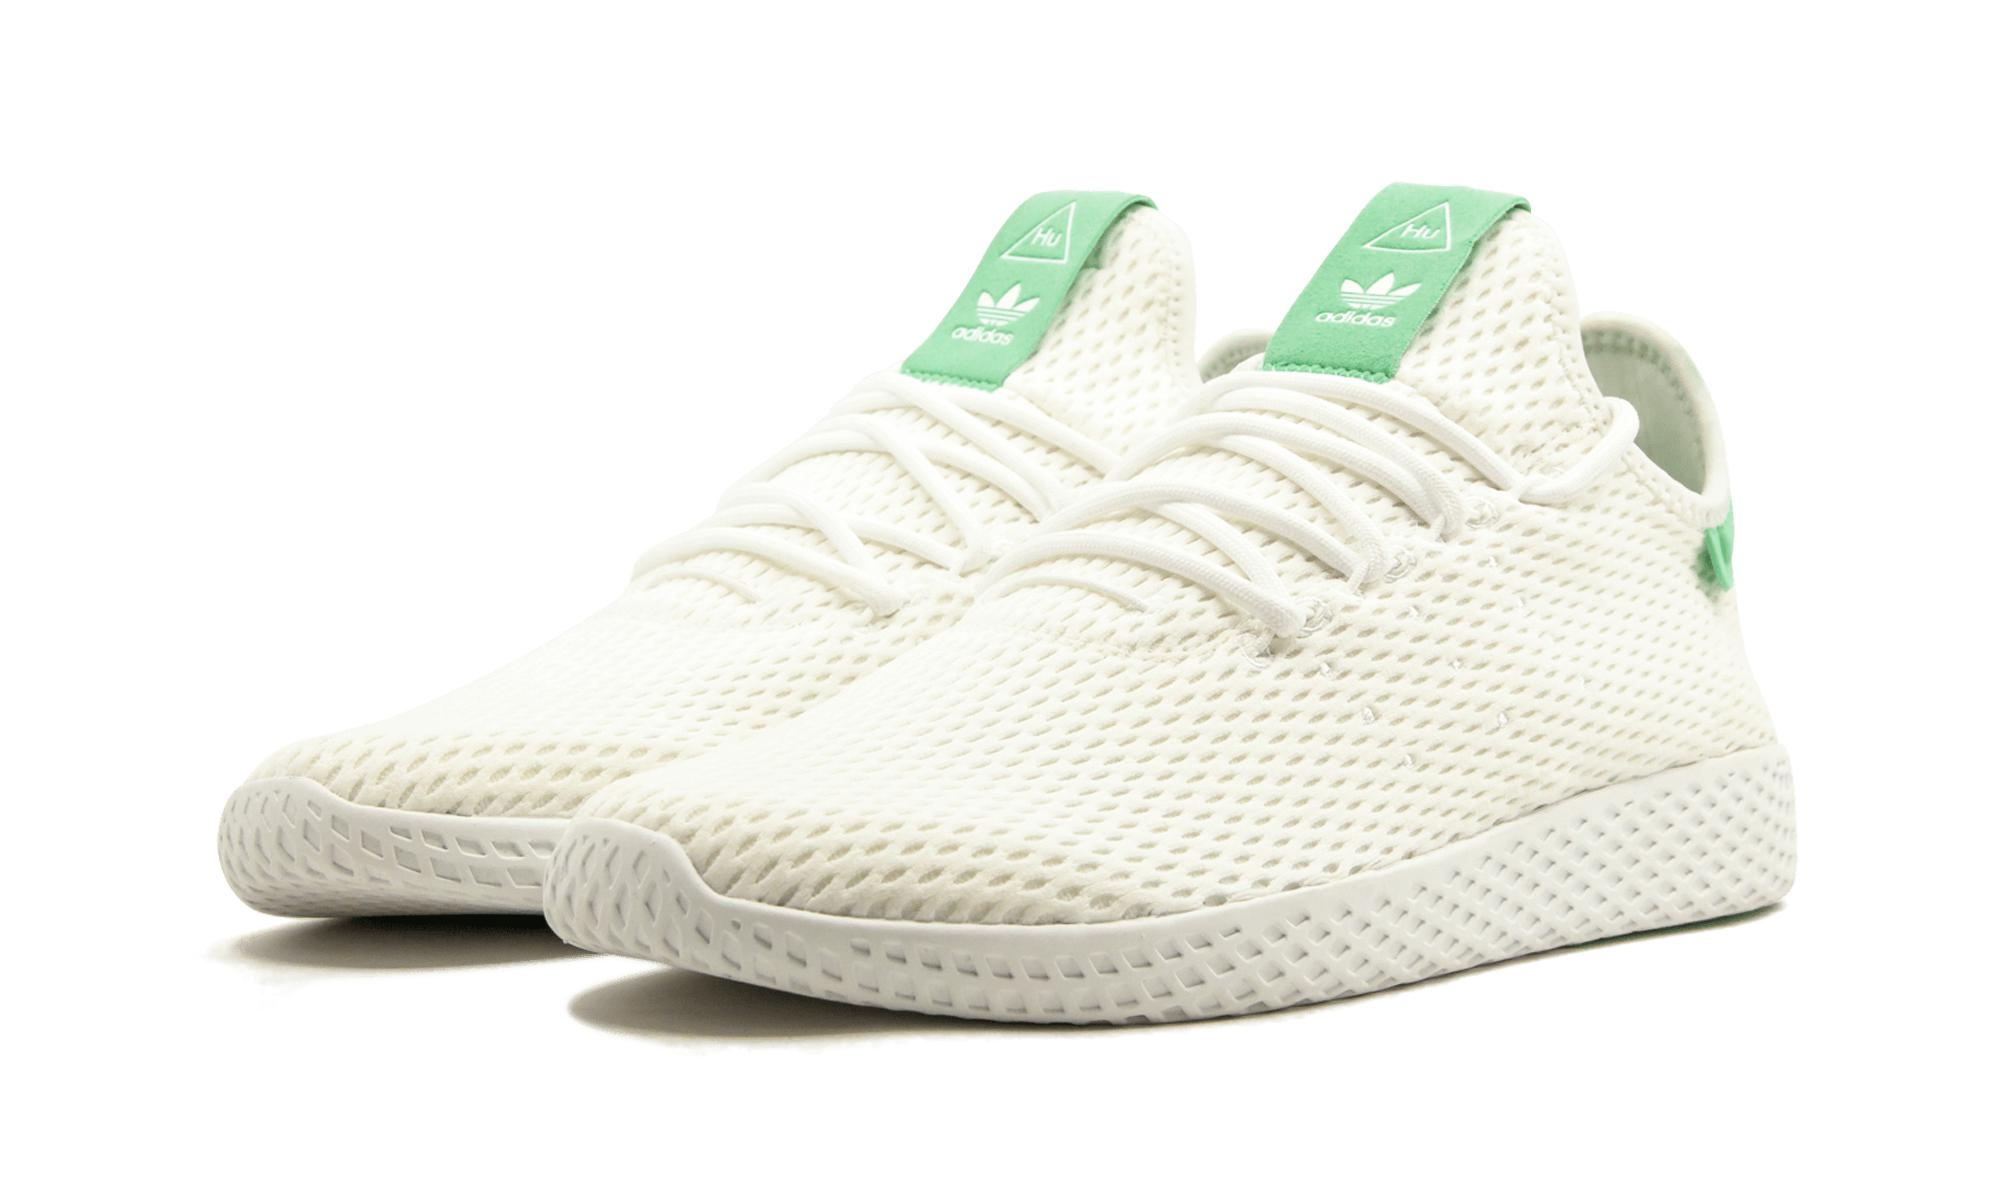 buy online 0a785 73c92 Adidas - White Pharrell Williams Tennis Hu for Men - Lyst. View fullscreen